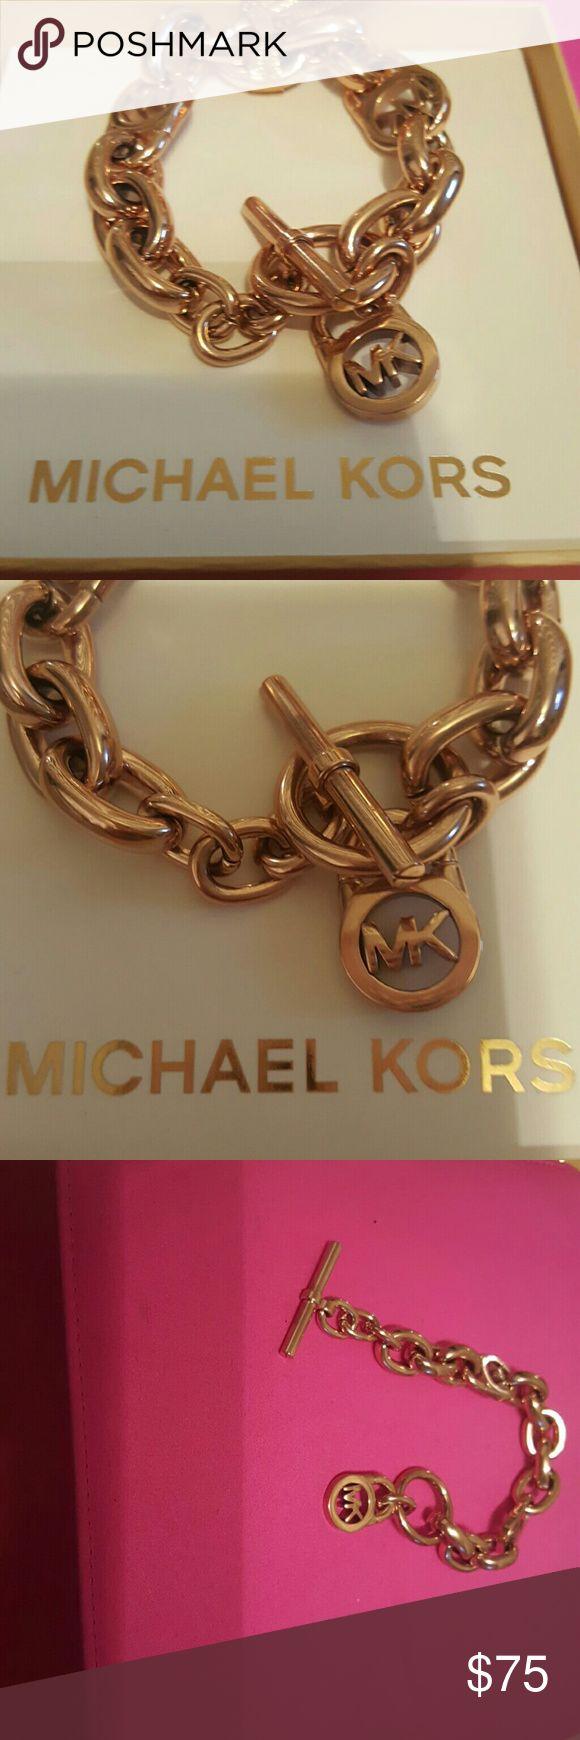 Gorgeous Michael Kors original bracelet Michael Kors original bracelete Michael Kors Jewelry Bracelets